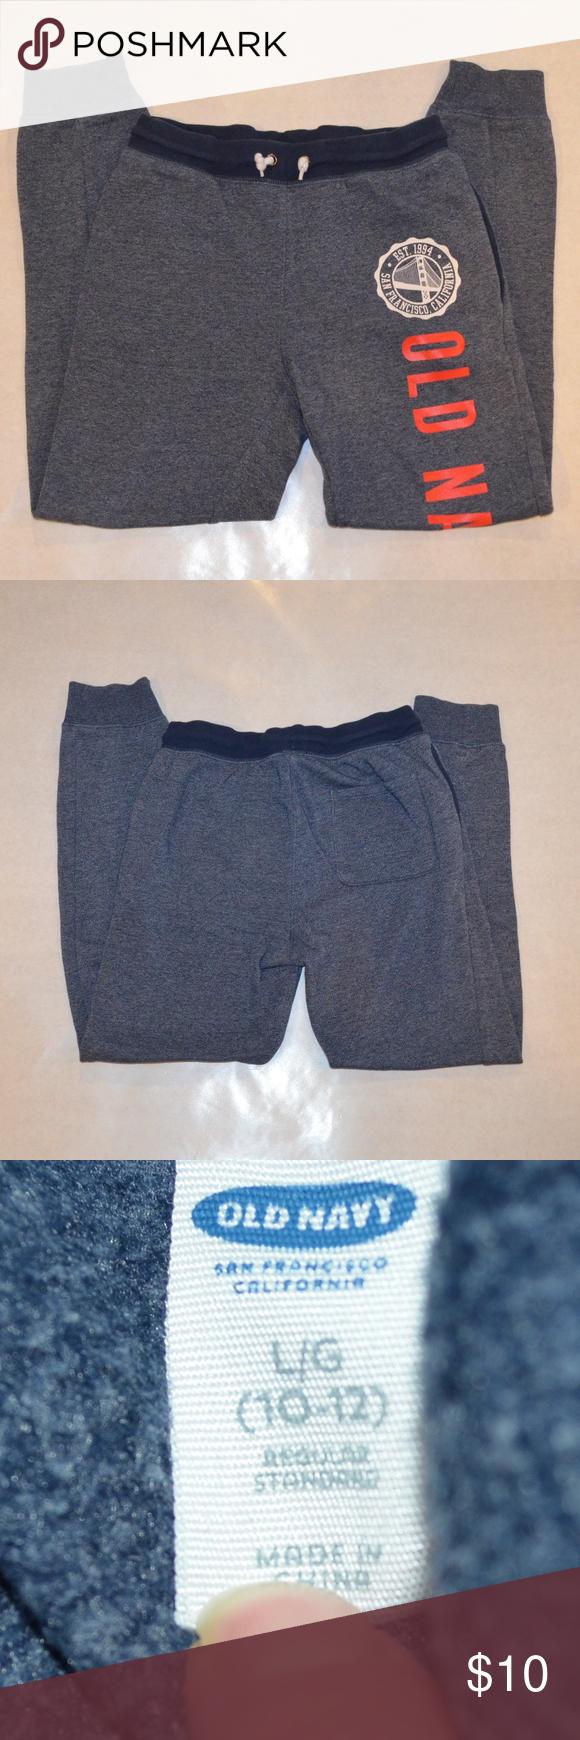 Old Navy Logo Boys Navy/Gray Sweatpants How to wear